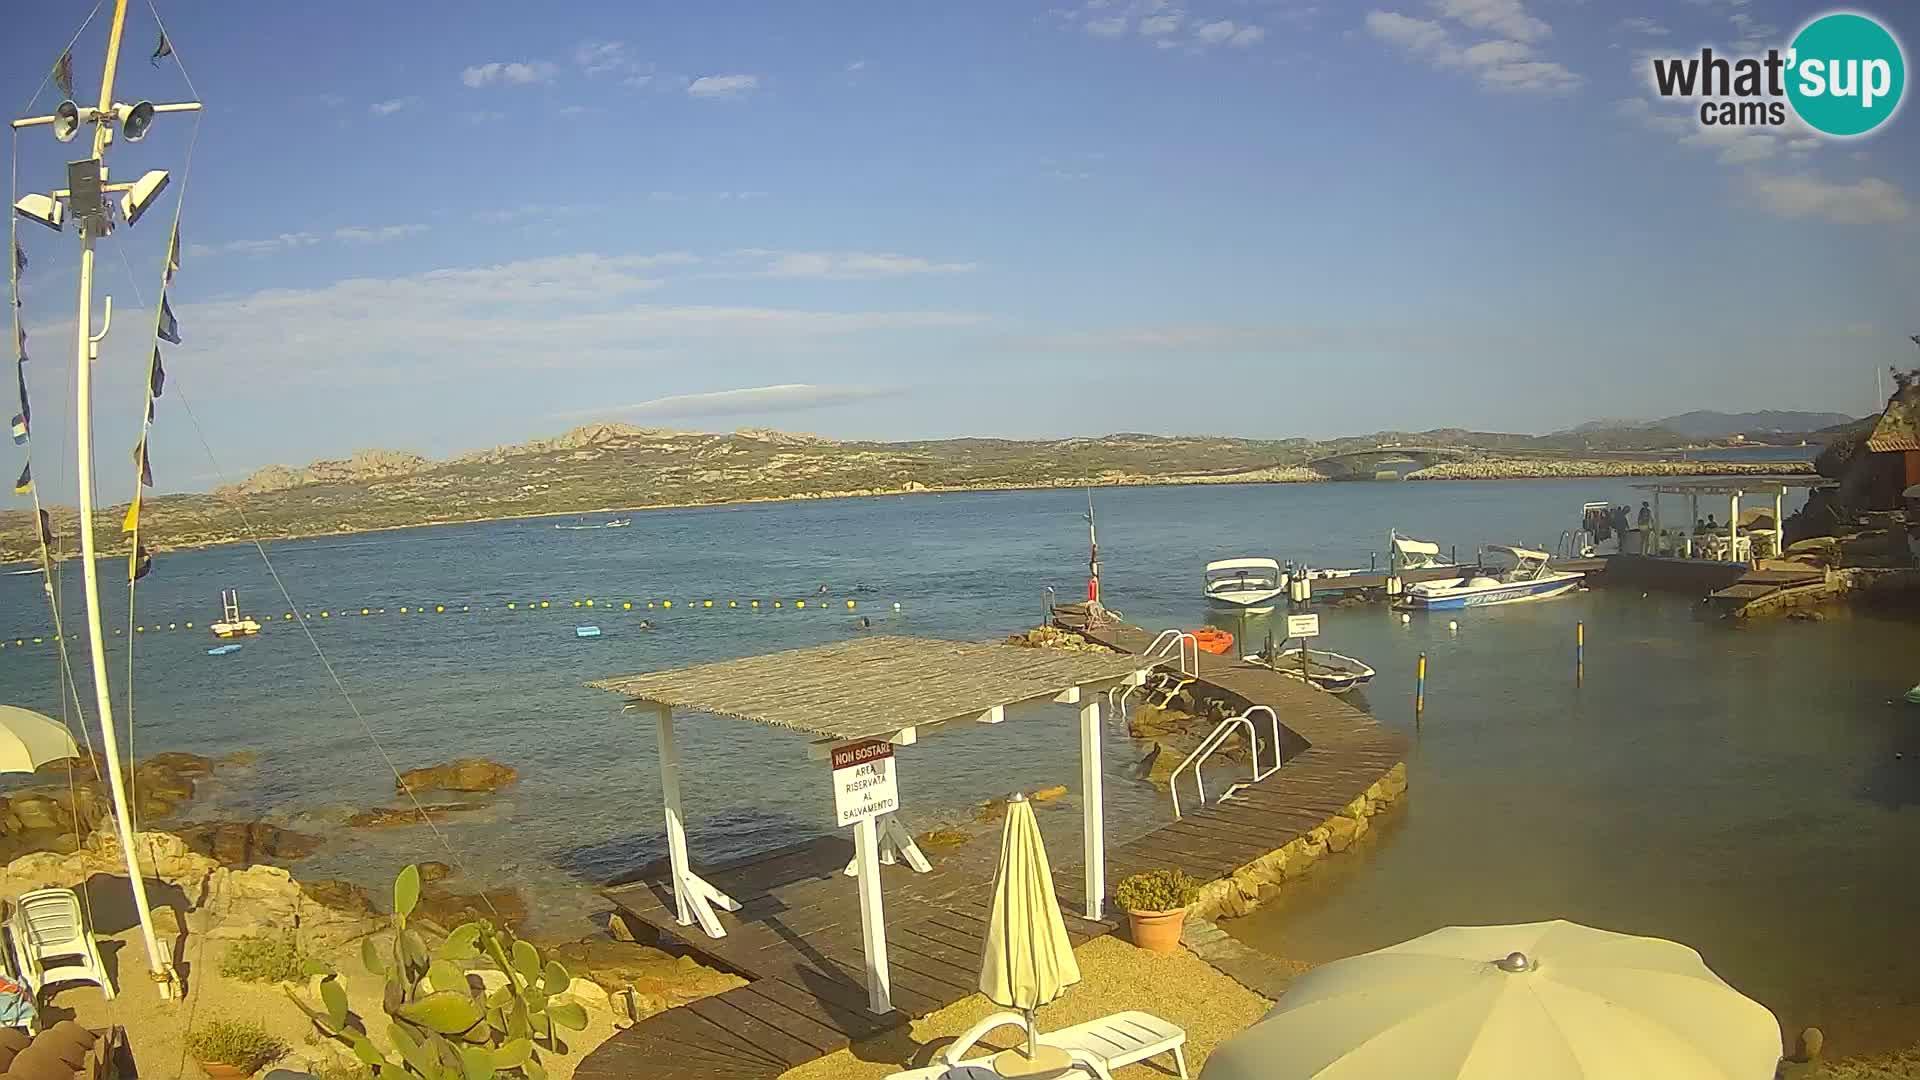 Le bateau Lo Squalo IV – webcam en direct arcipelago La Maddalena – Sardaigne – Italie